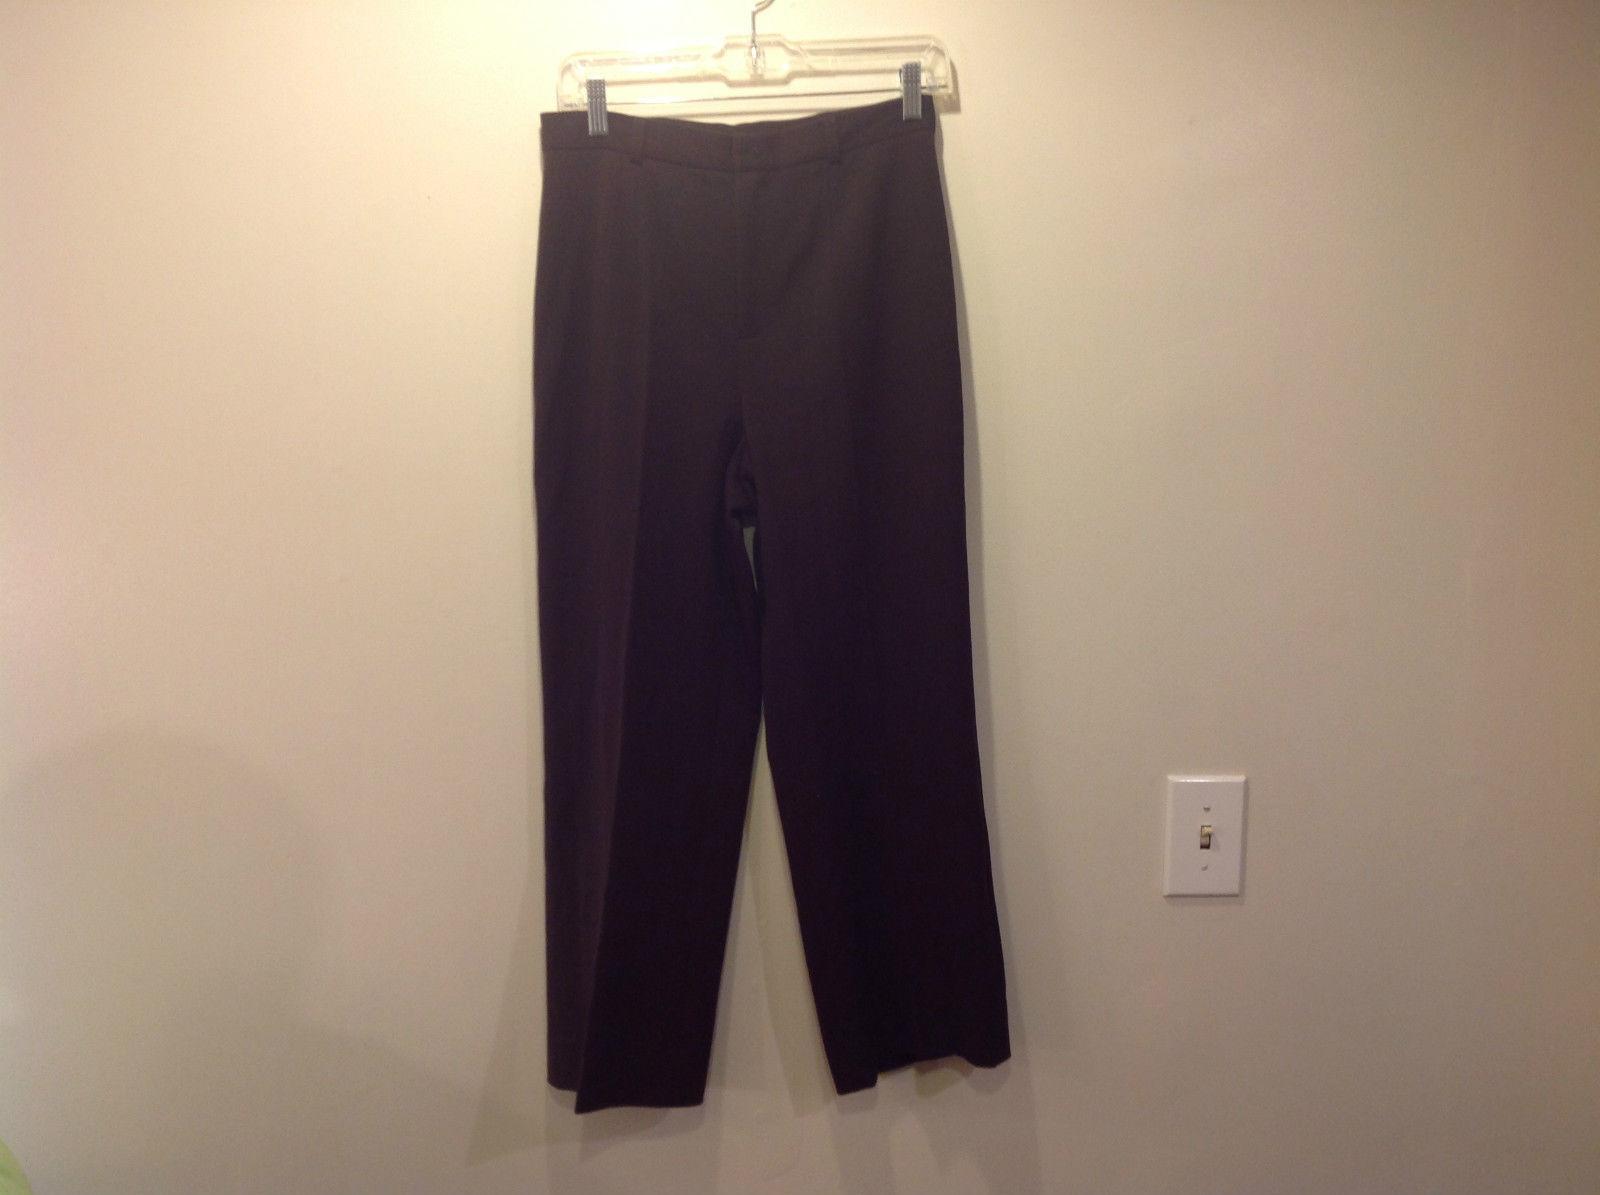 Grace Elements Brown Dress Pants Size 6 Button and Zipper Closure Good Condition